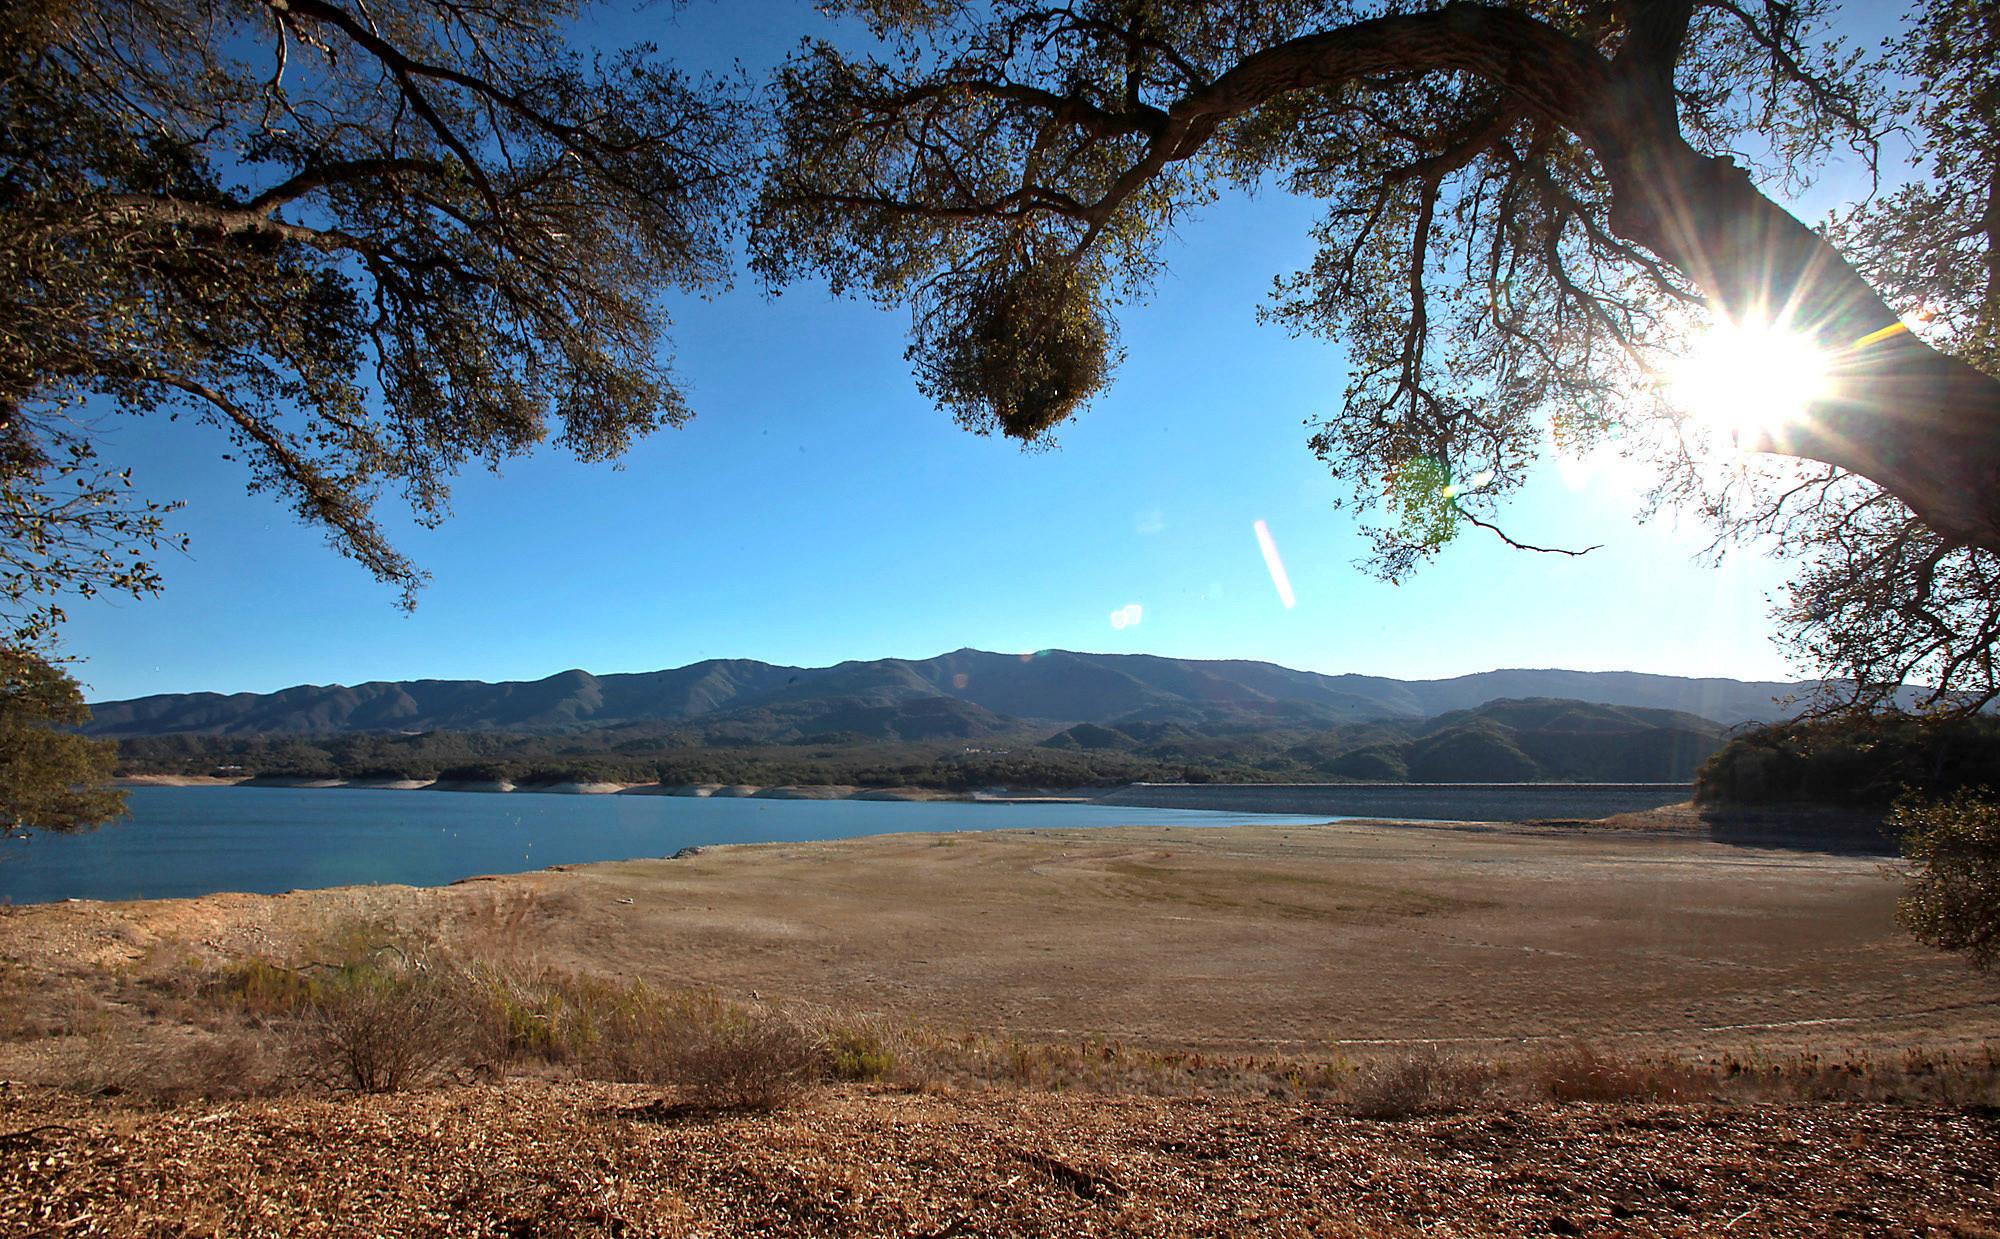 State awards $2 million to Cachuma Lake pumping project